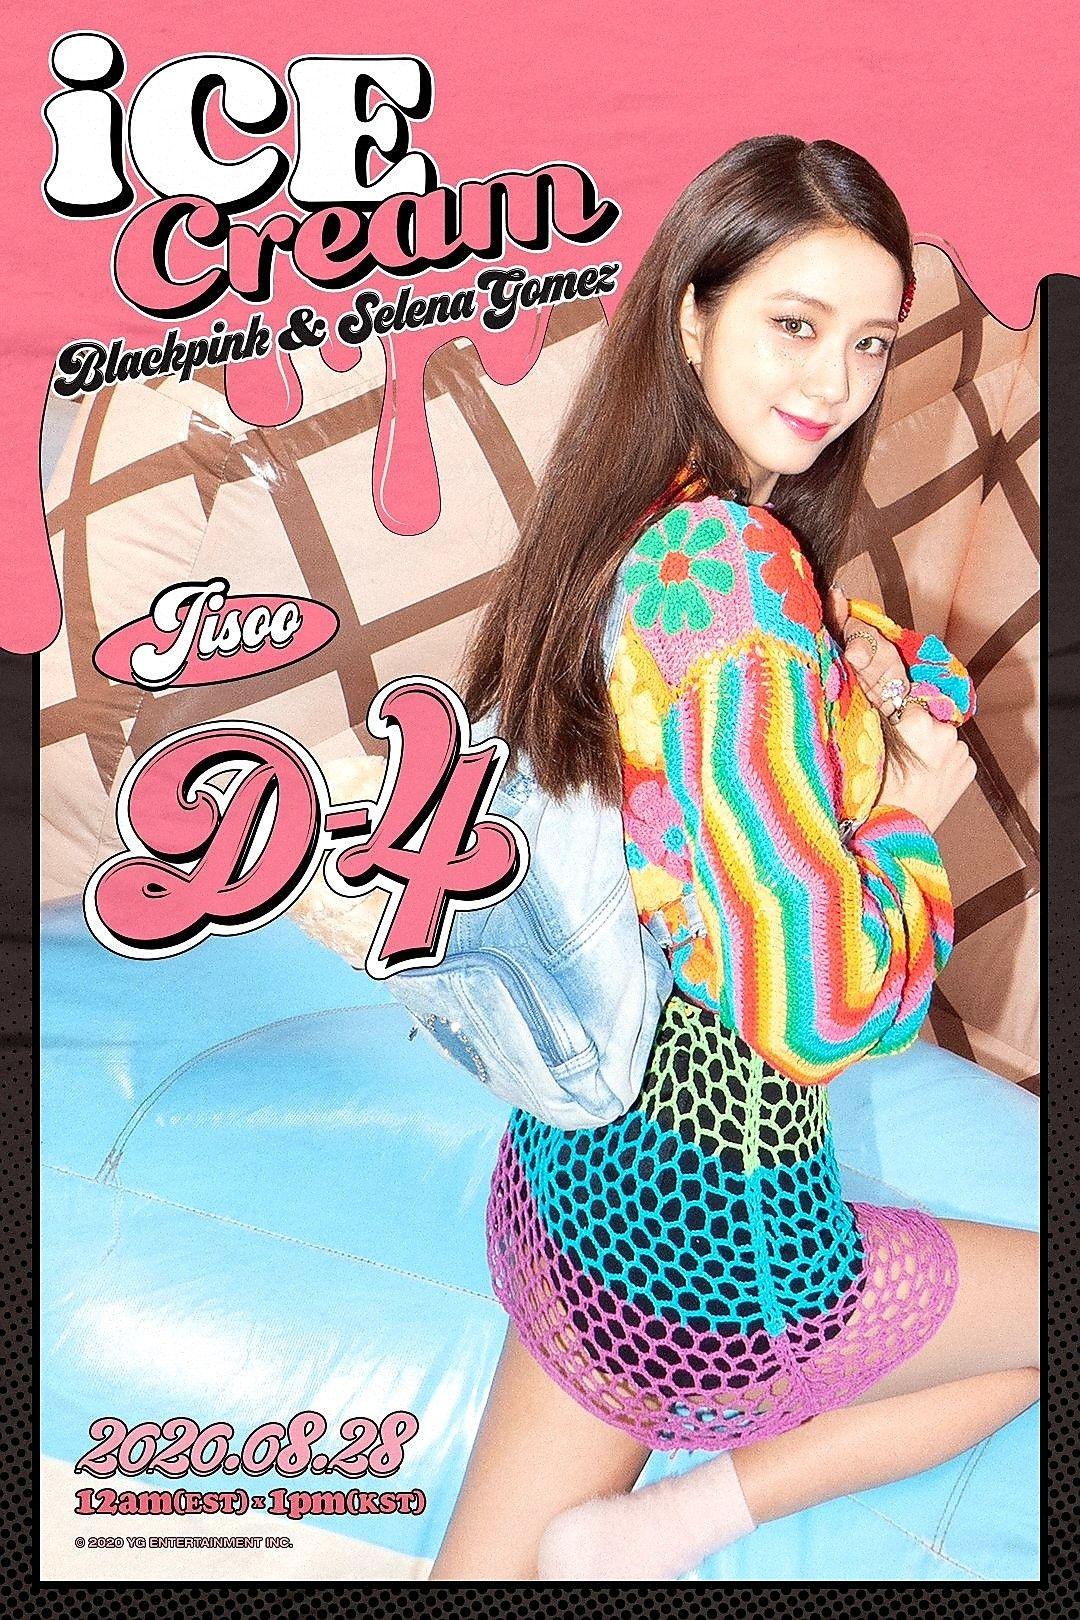 Blackpink Jisoo Ice Cream Poster D 4 In 2020 Selena Gomez Black Pink Kpop Blackpink Jisoo